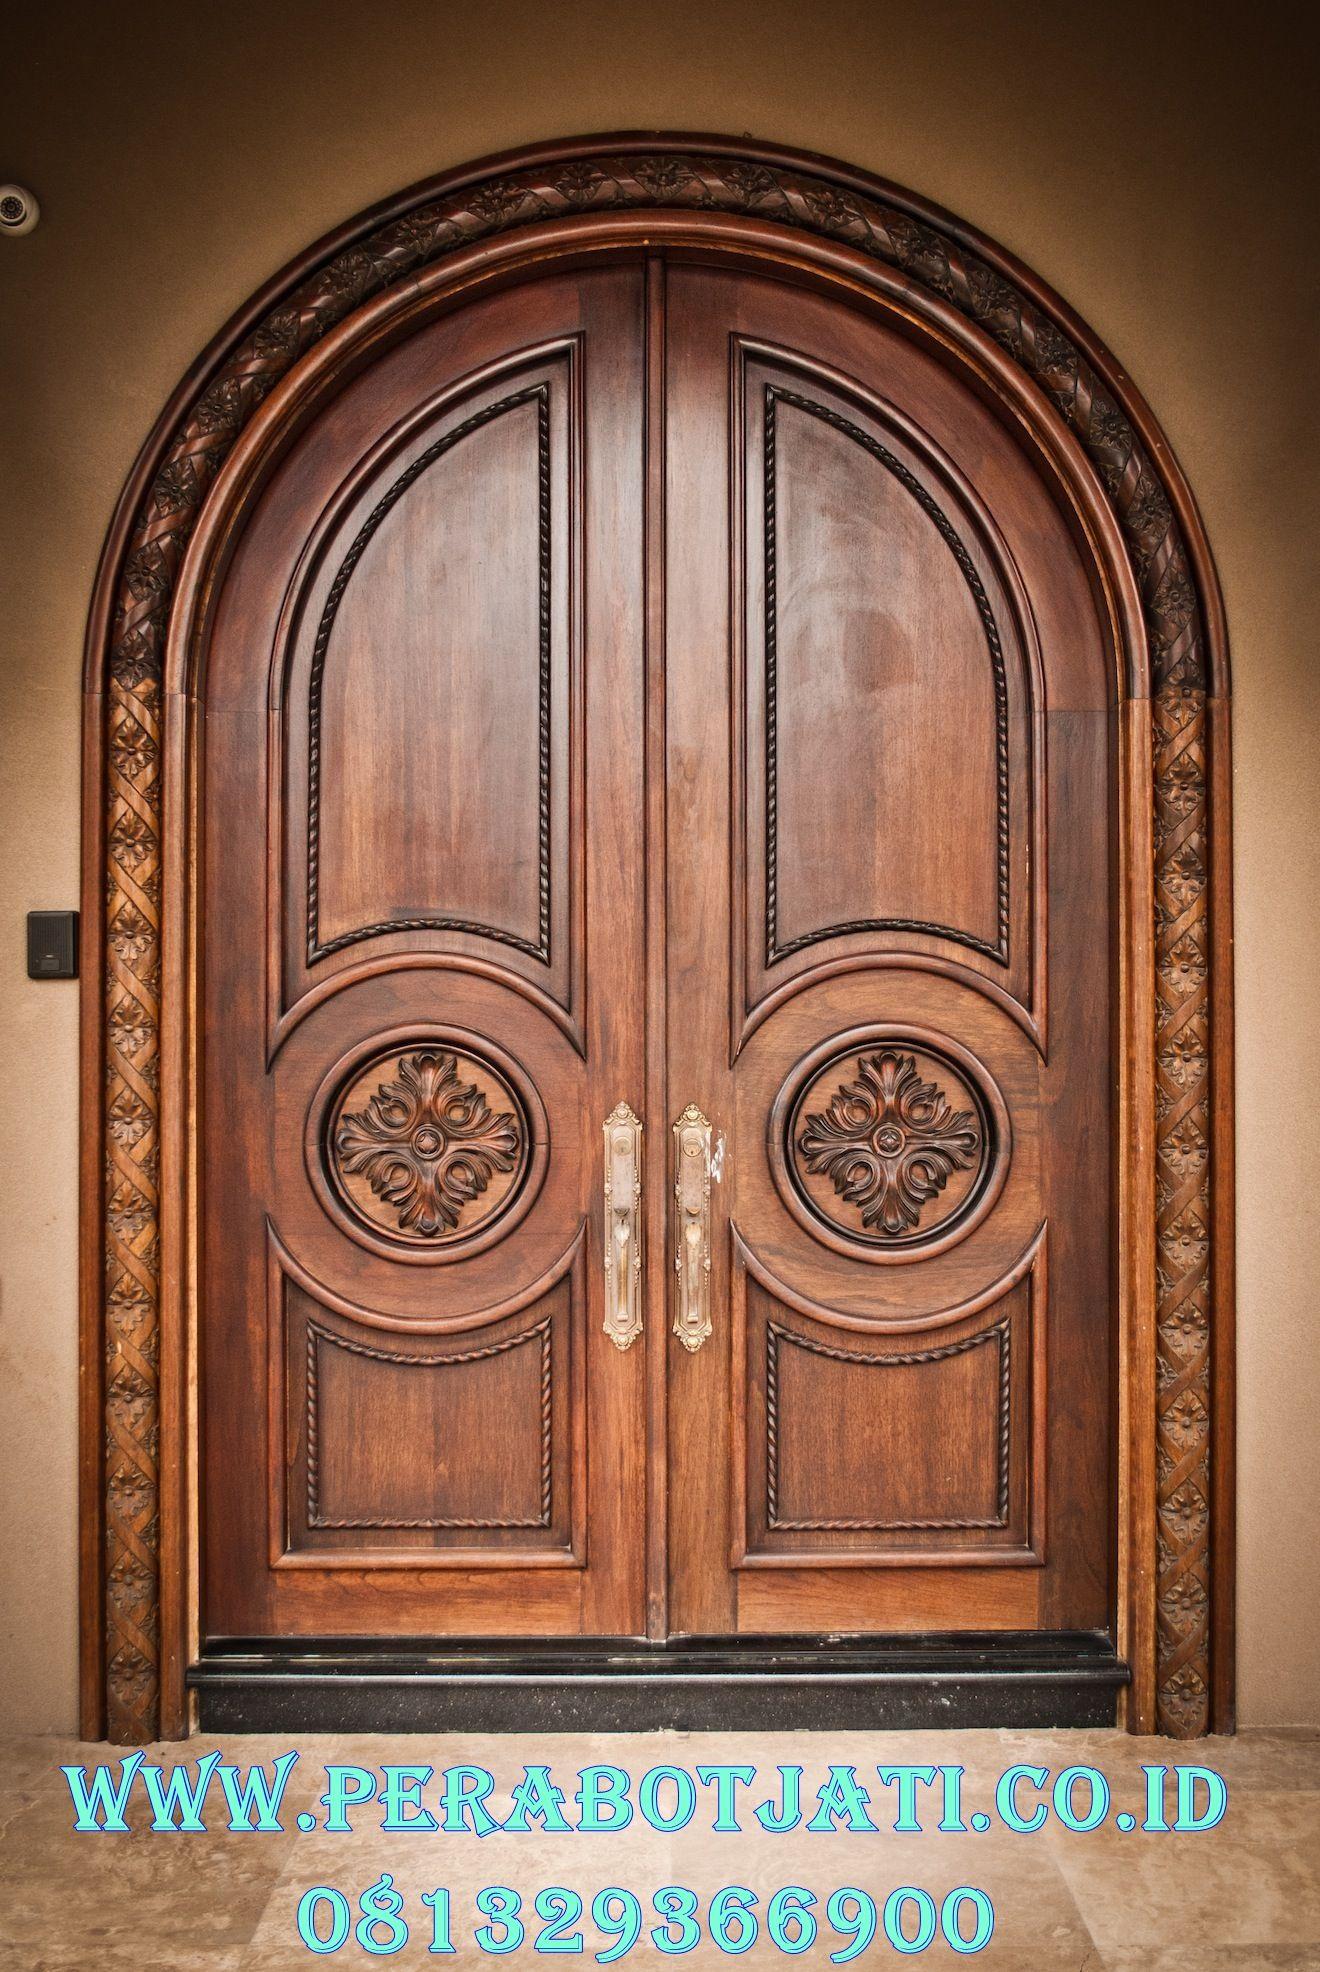 Kusen Pintu Utama Lengkung Model Klasik Eropa Desain Pintu Masuk Desain Pintu Modern The Doors